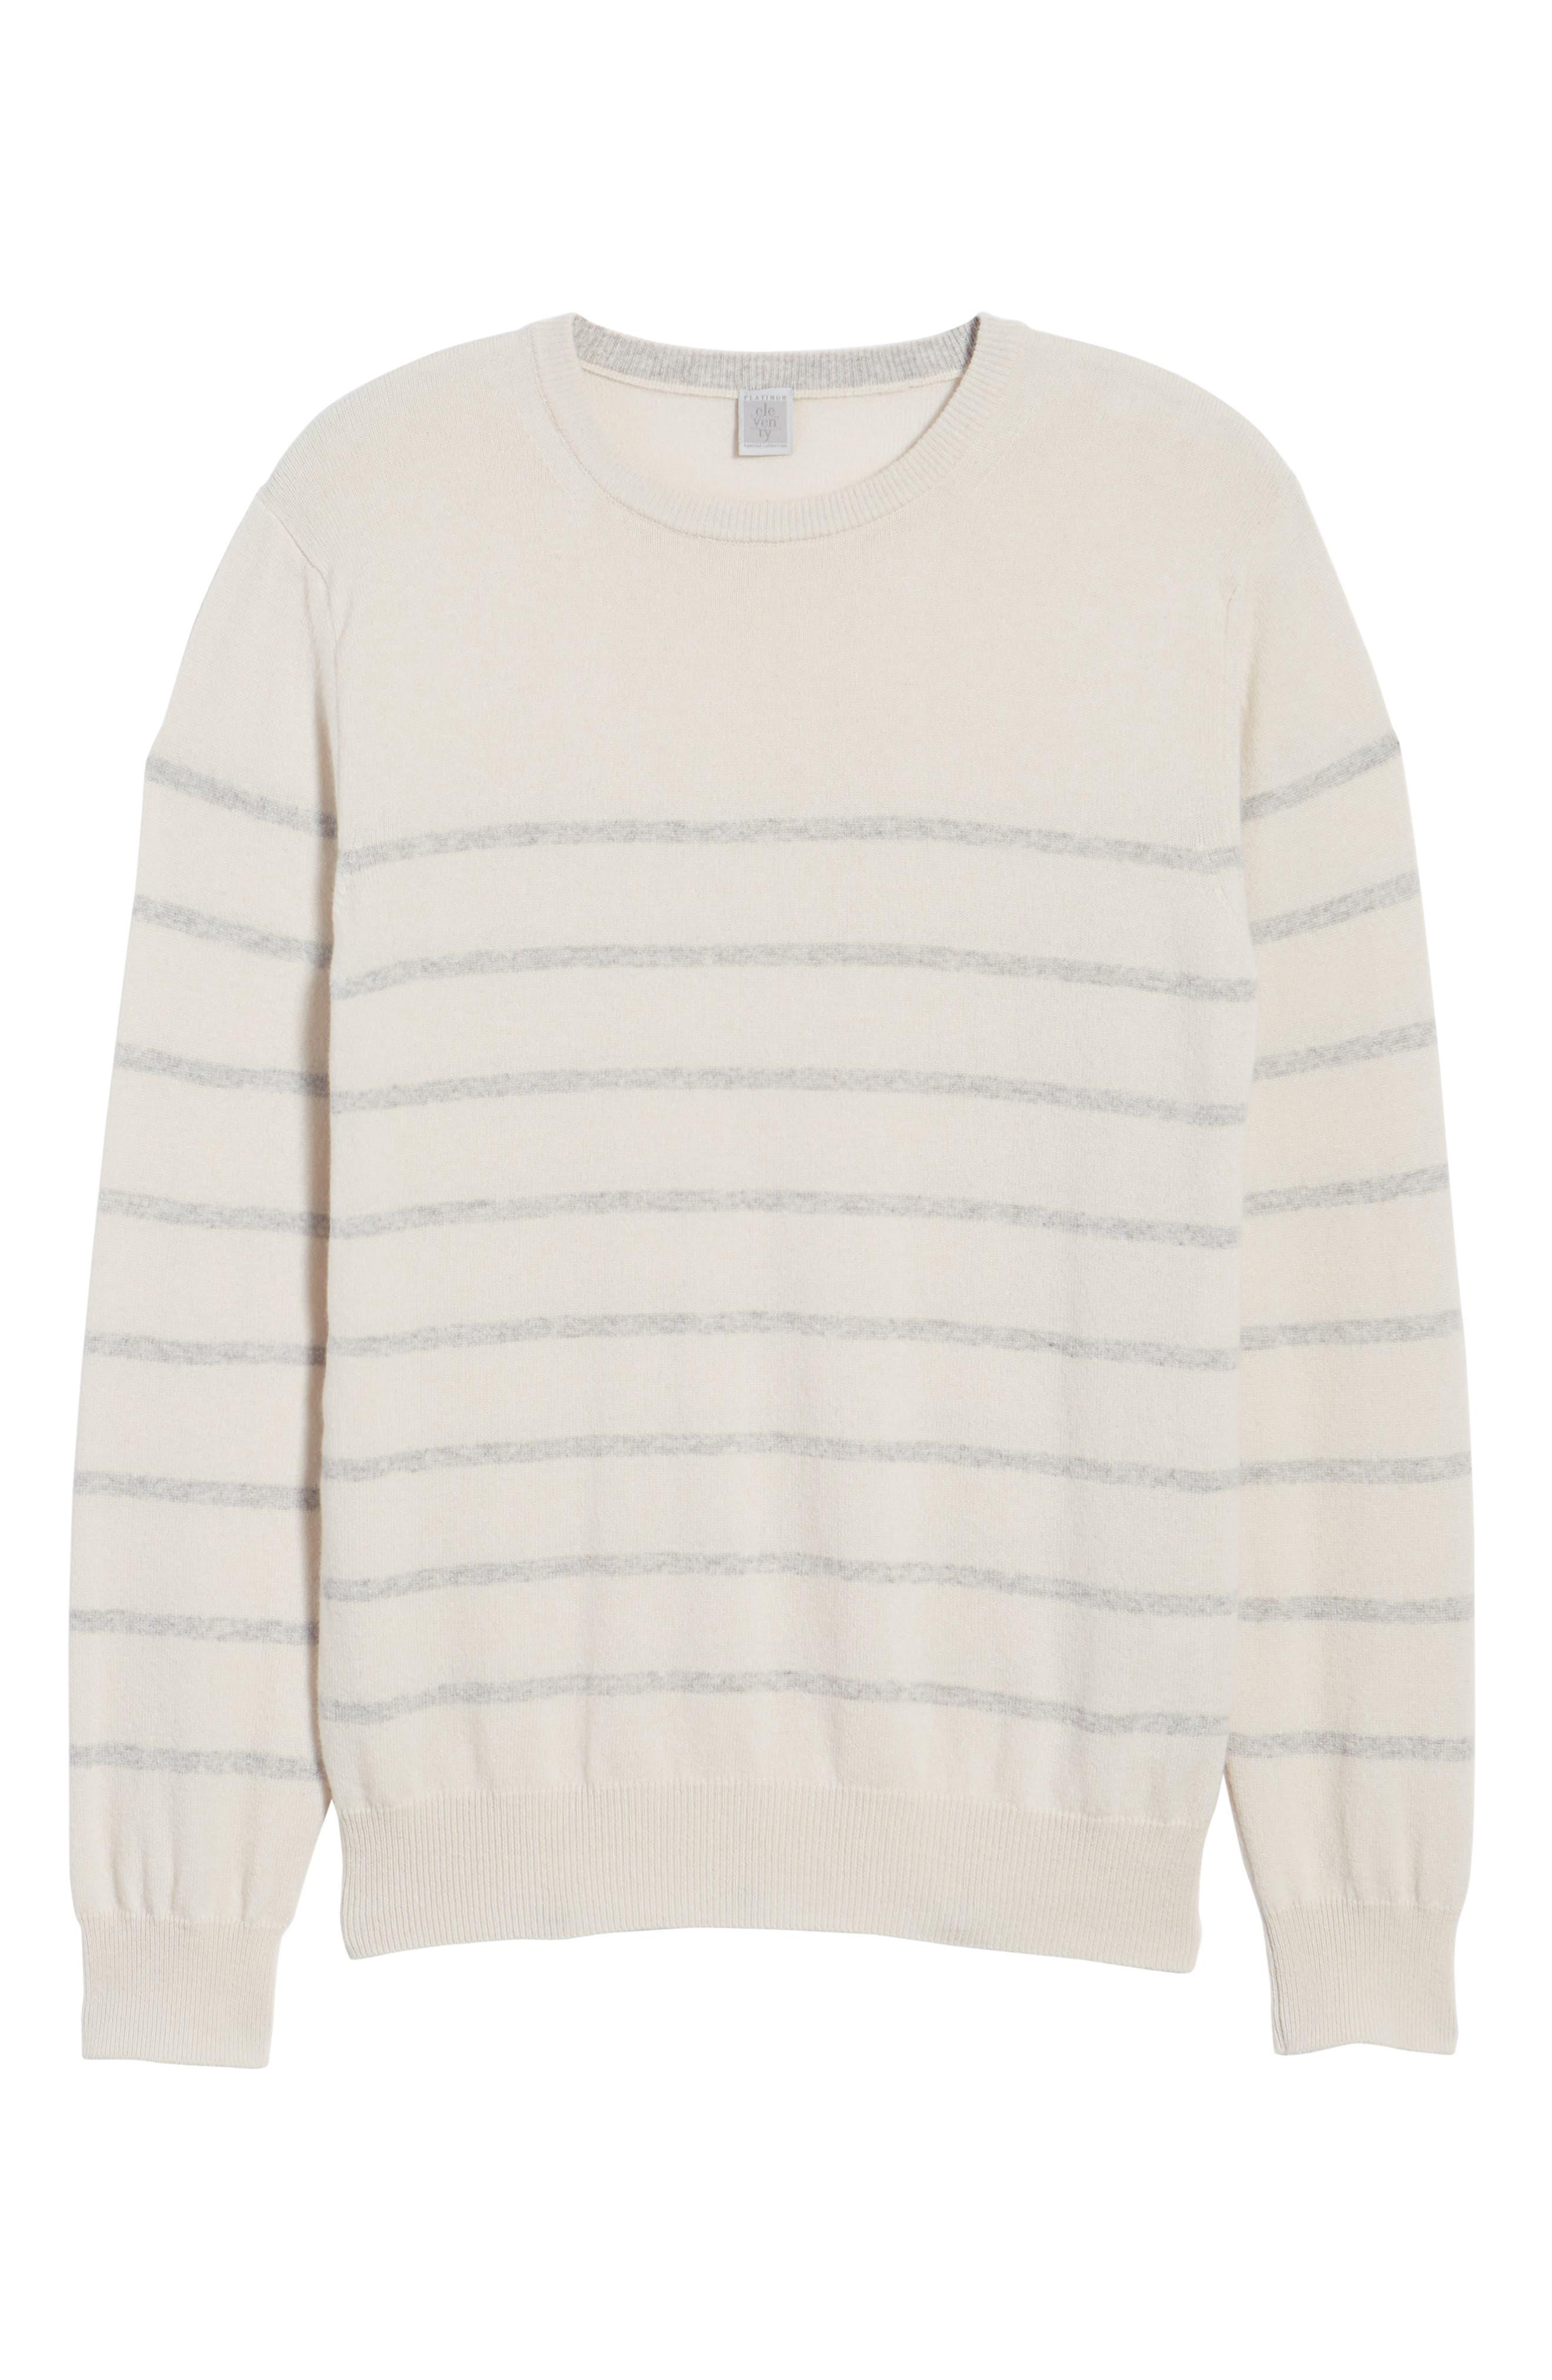 Cashmere Crewneck Sweater,                             Alternate thumbnail 6, color,                             Ivory